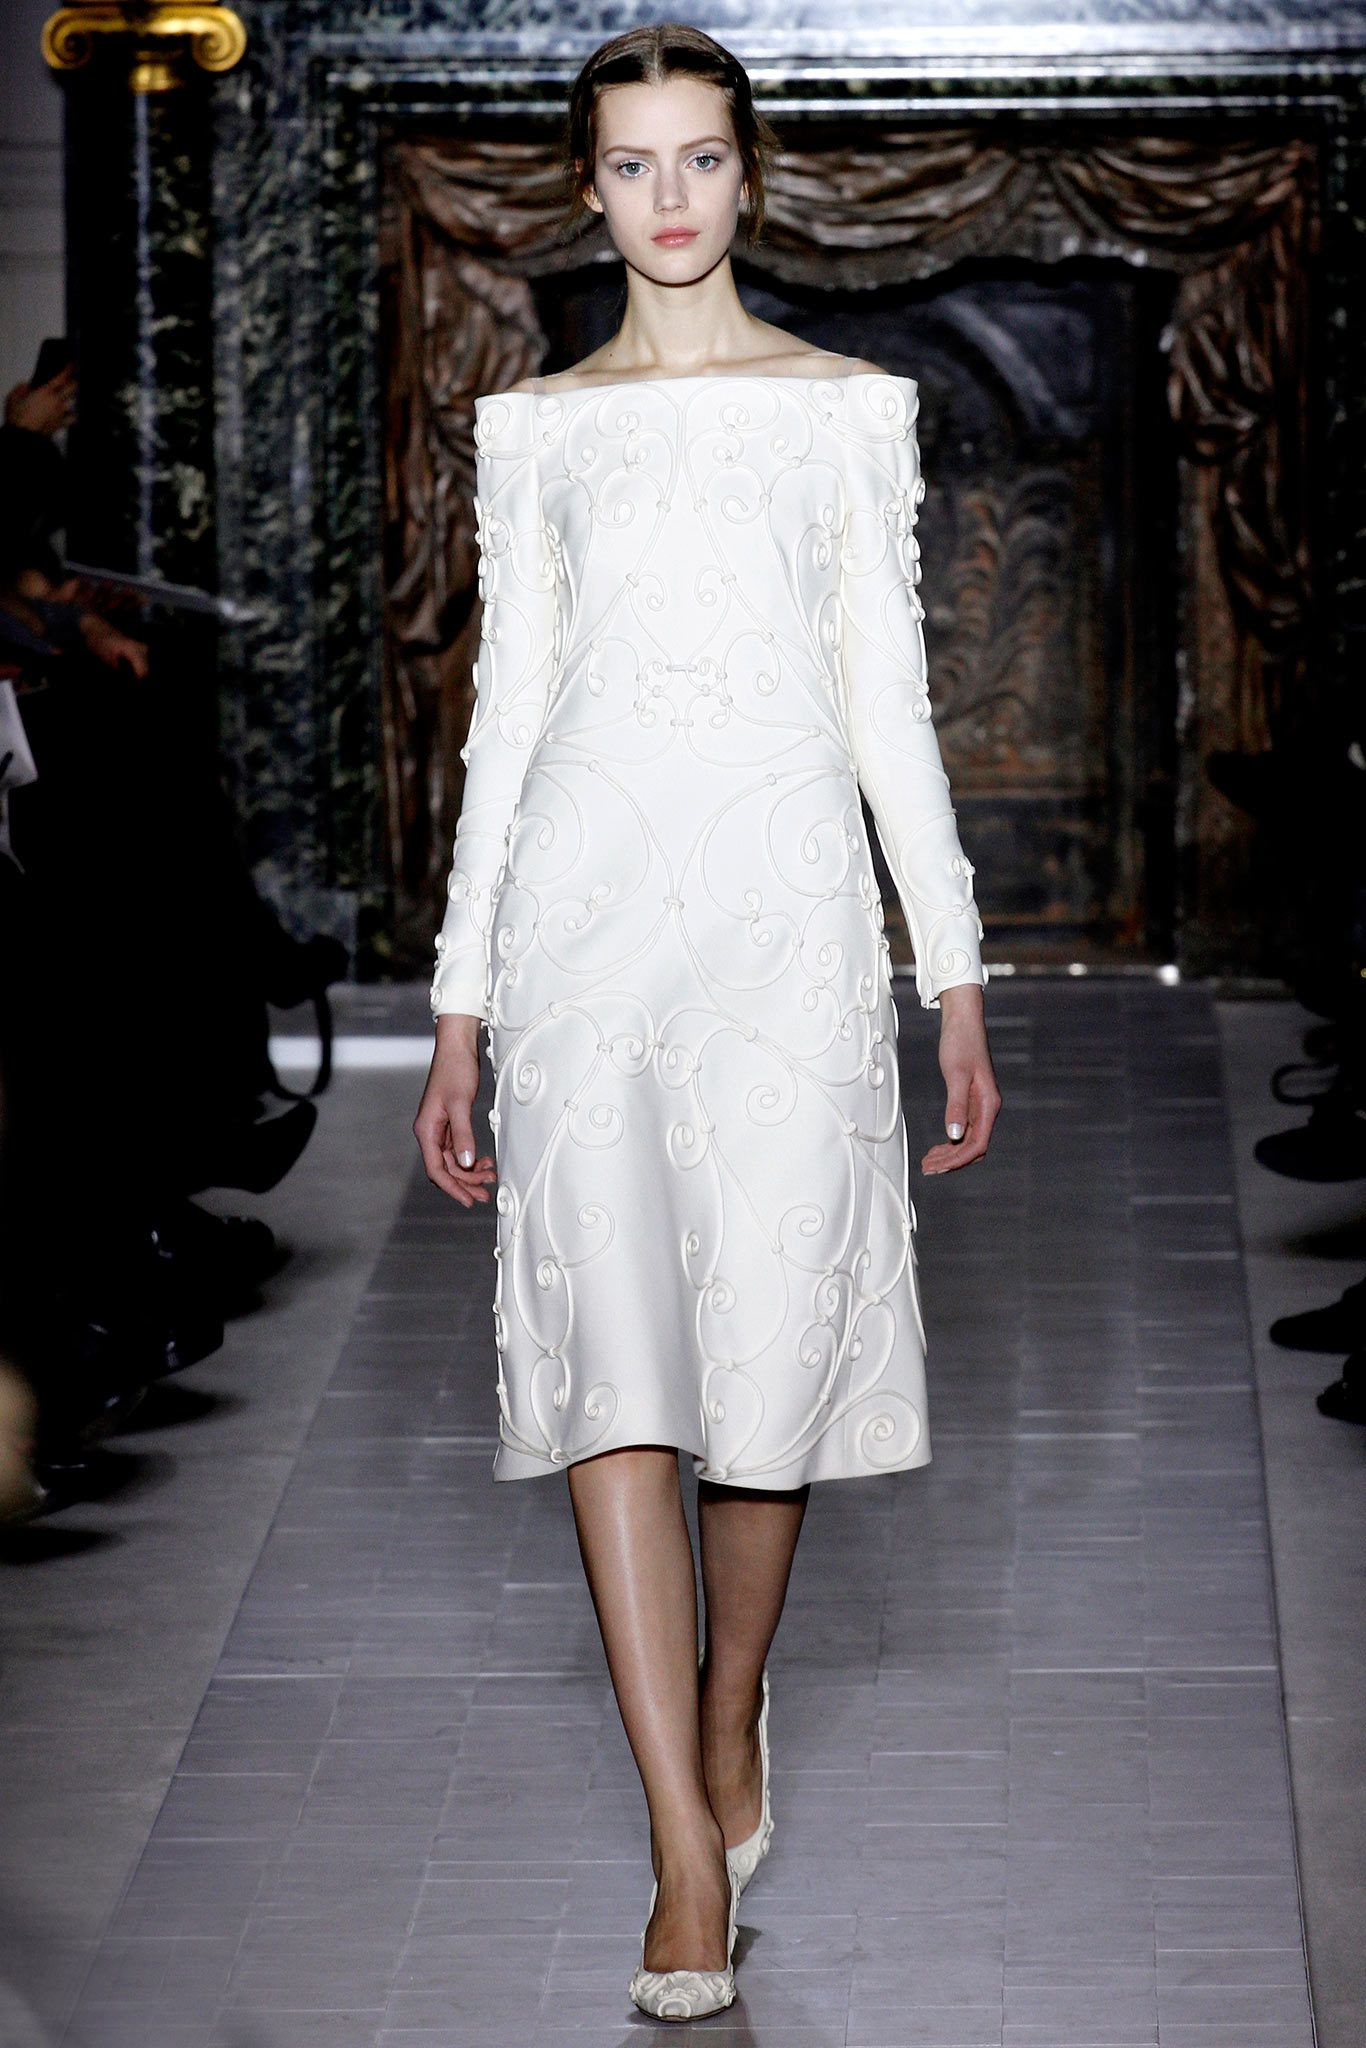 Valentino Garavani spring 2013 couture collection. See more: #ValentinoGaravaniAtFip, #FashionInPics